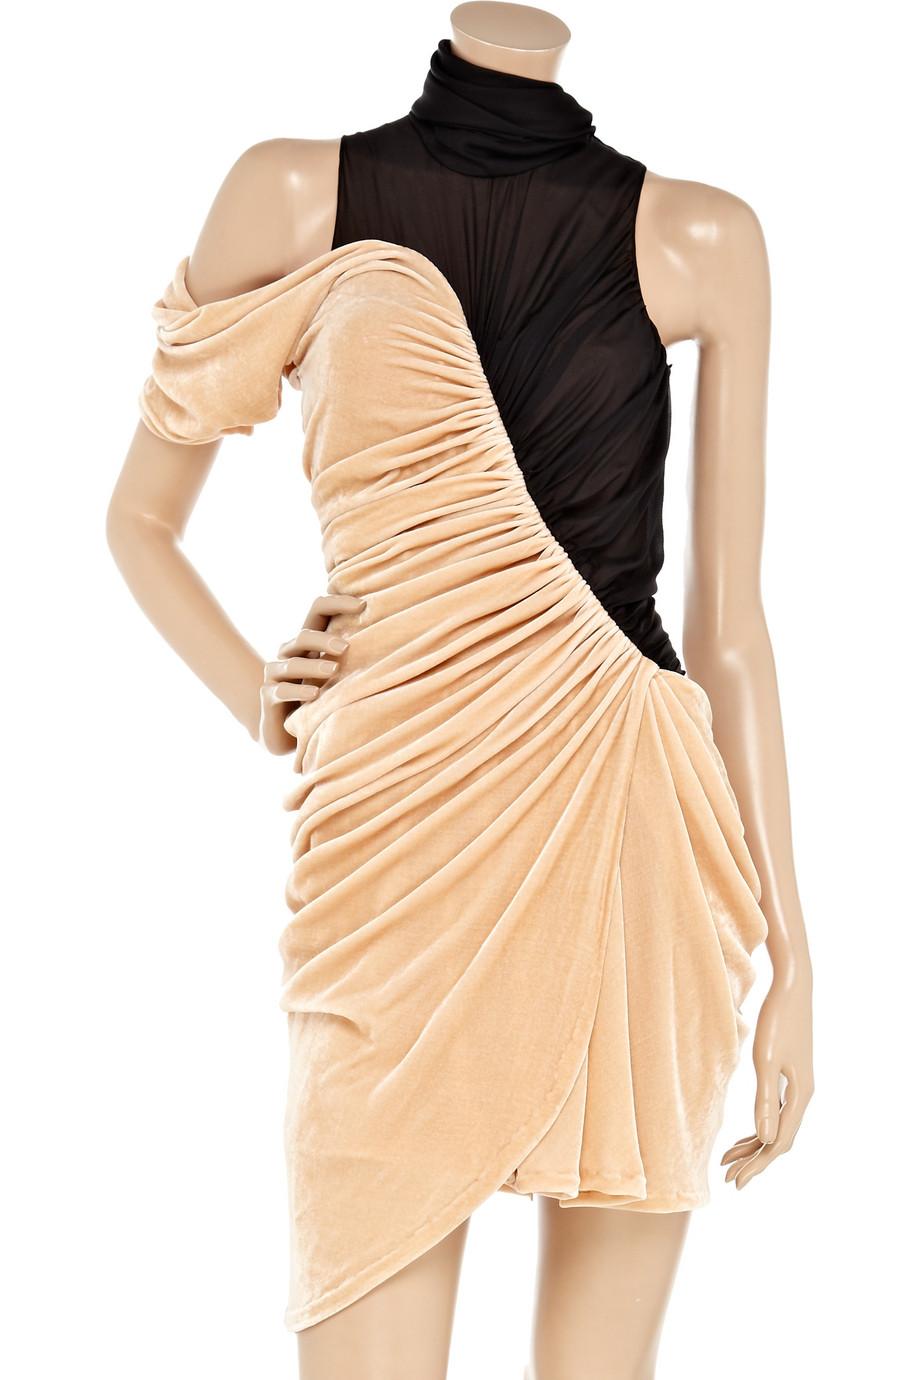 Cheap For Sale Alexander Wang Velvet Knee-Length Dress Extremely IDn36cmdr